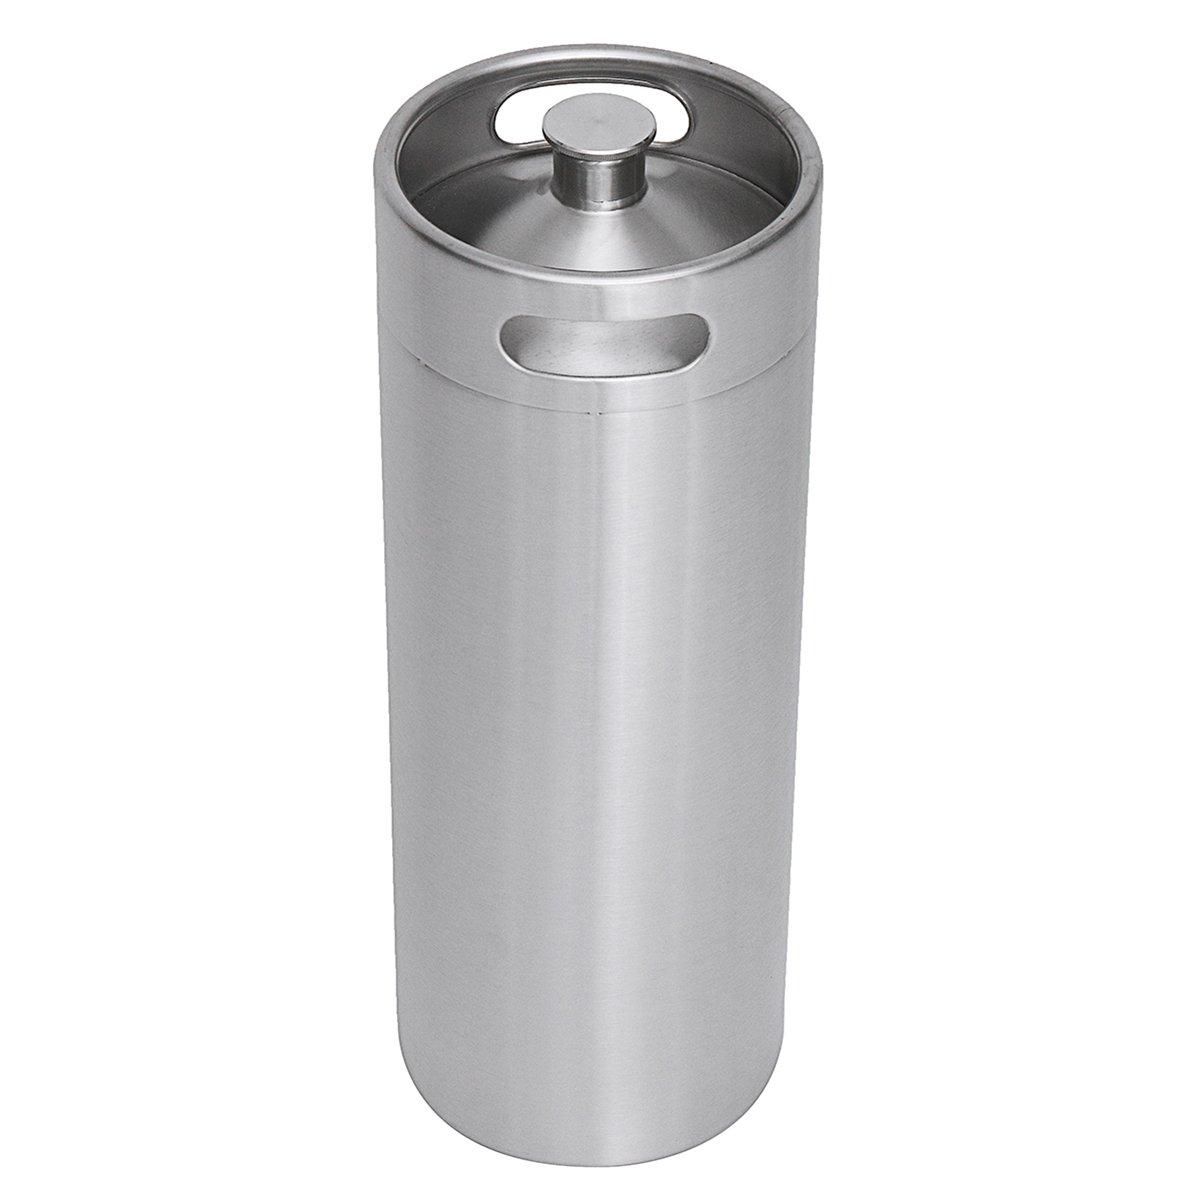 Stainless Steel Brew Barrel, SENREAL 10L Stainless Steel Cast Growler Barrel Beer Wine Making Tools Accessories